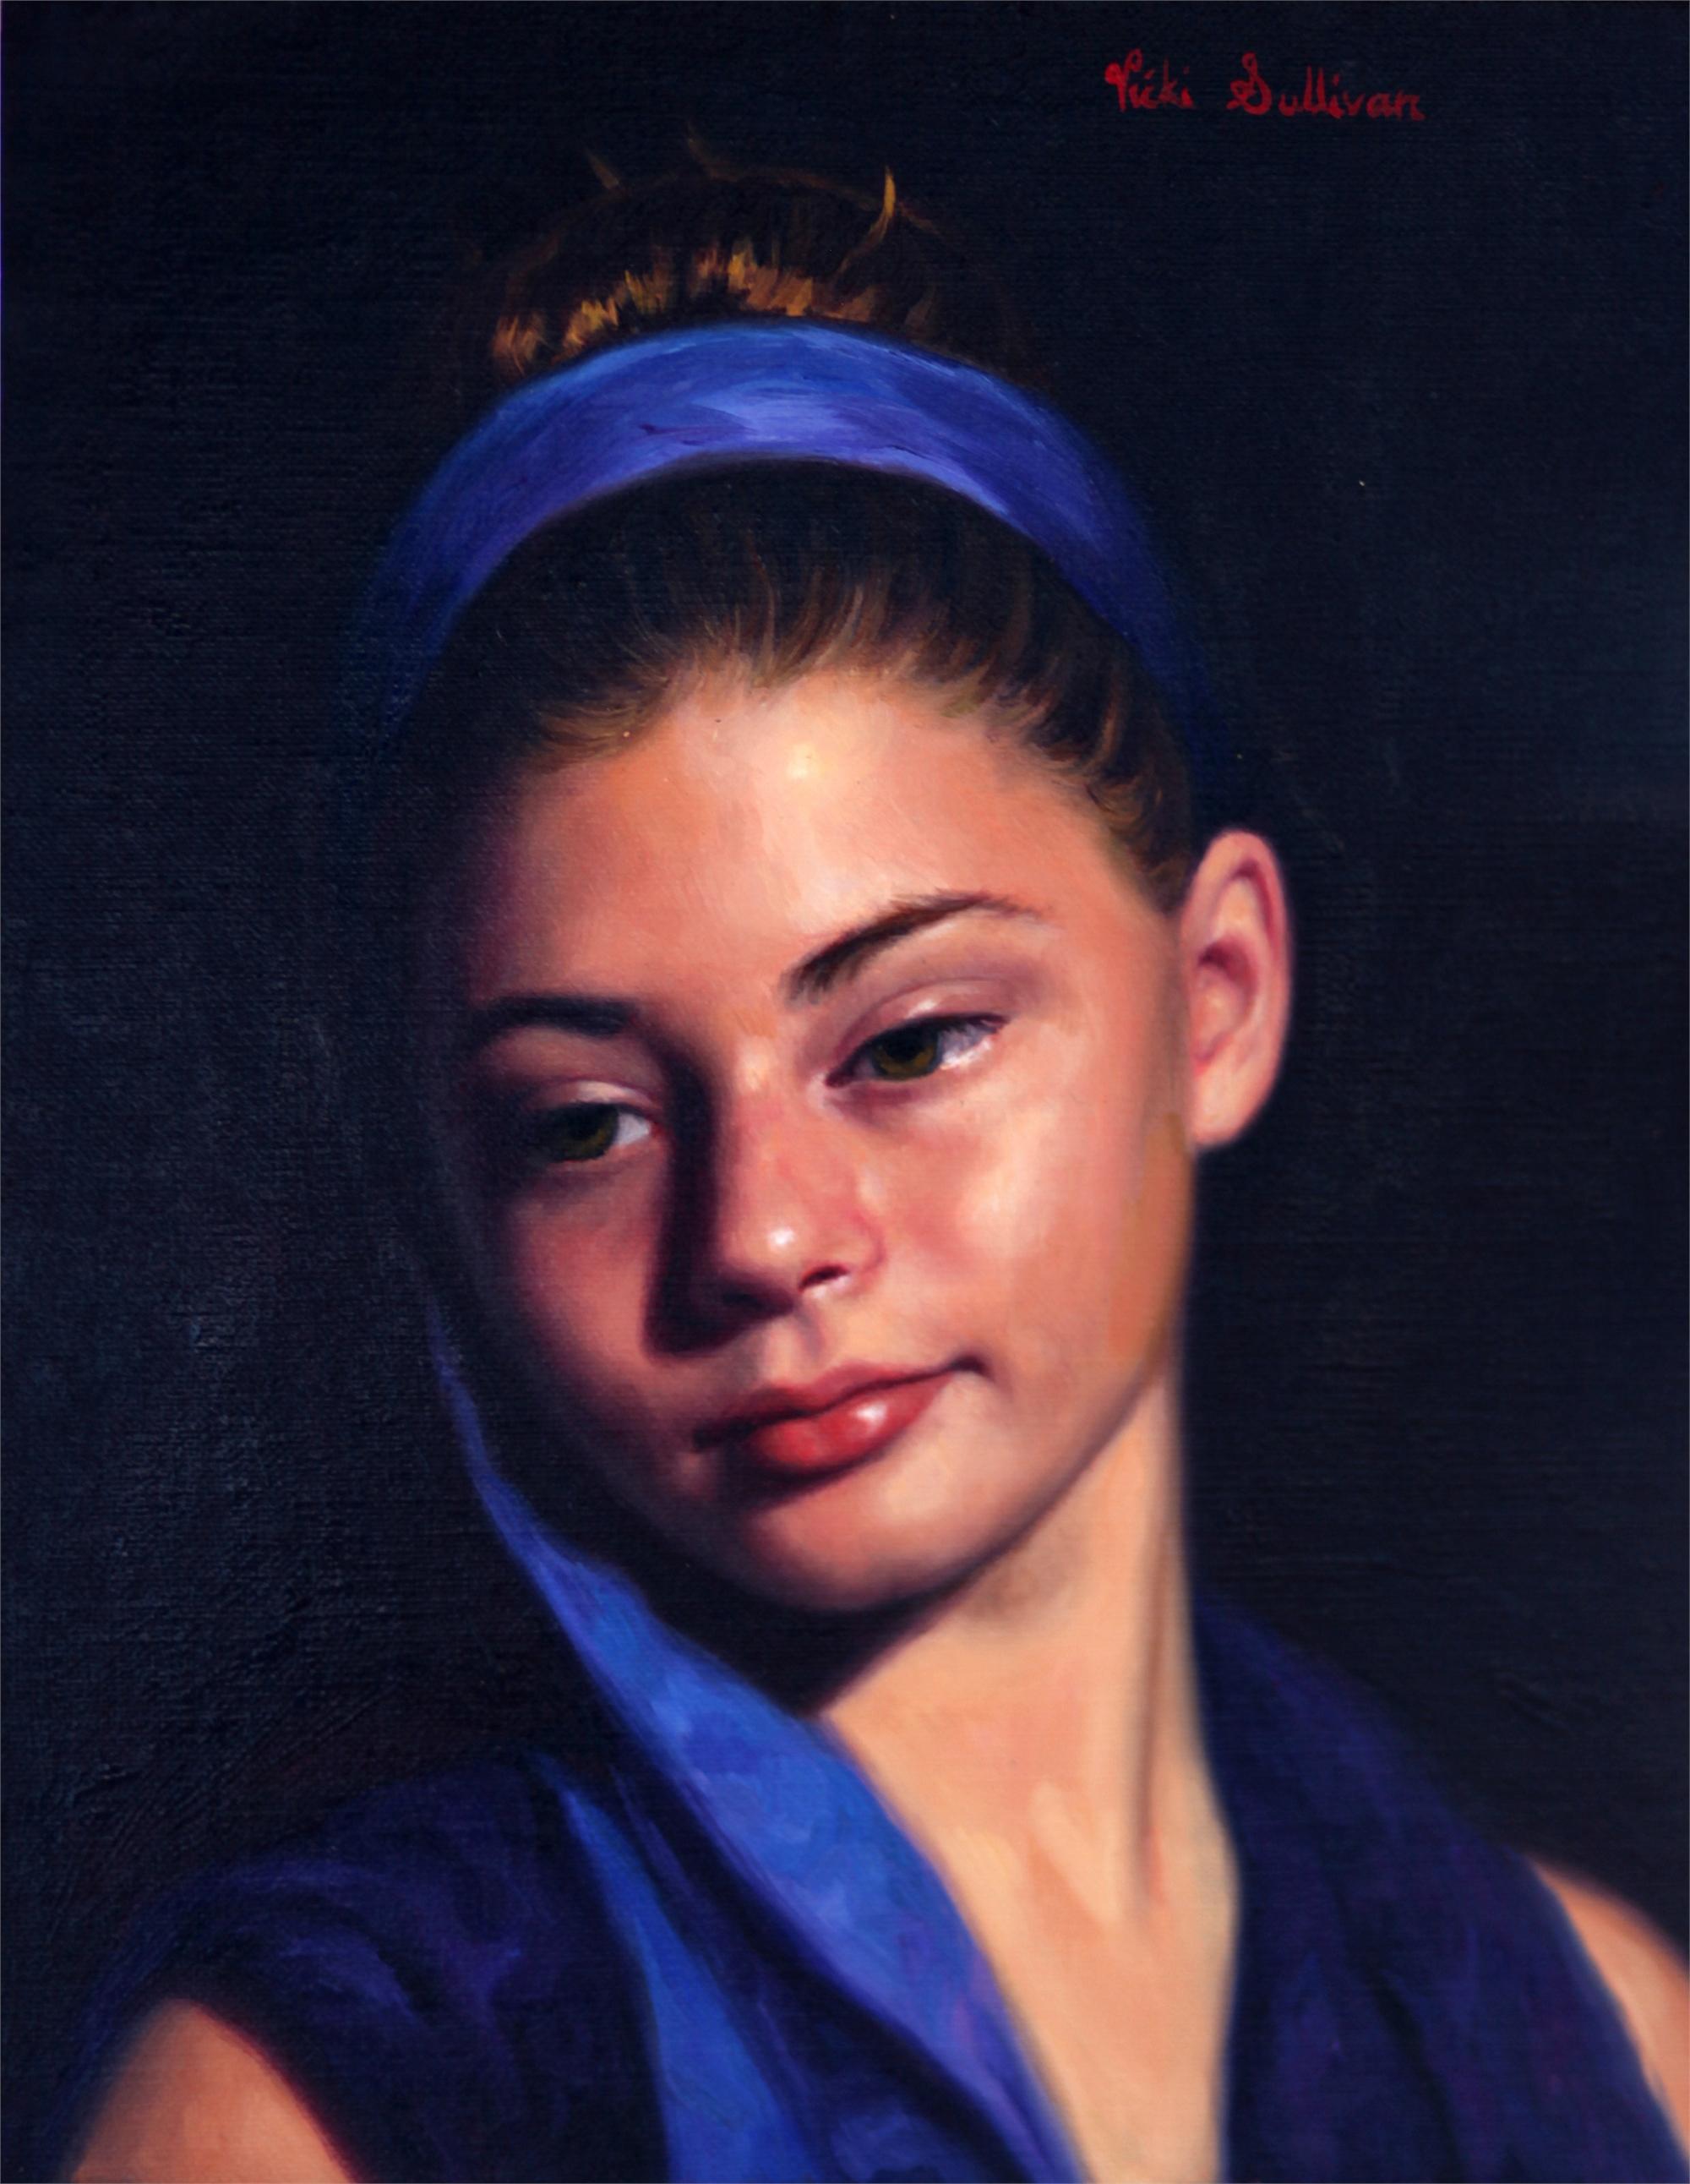 Blue by Vicki Sullivan